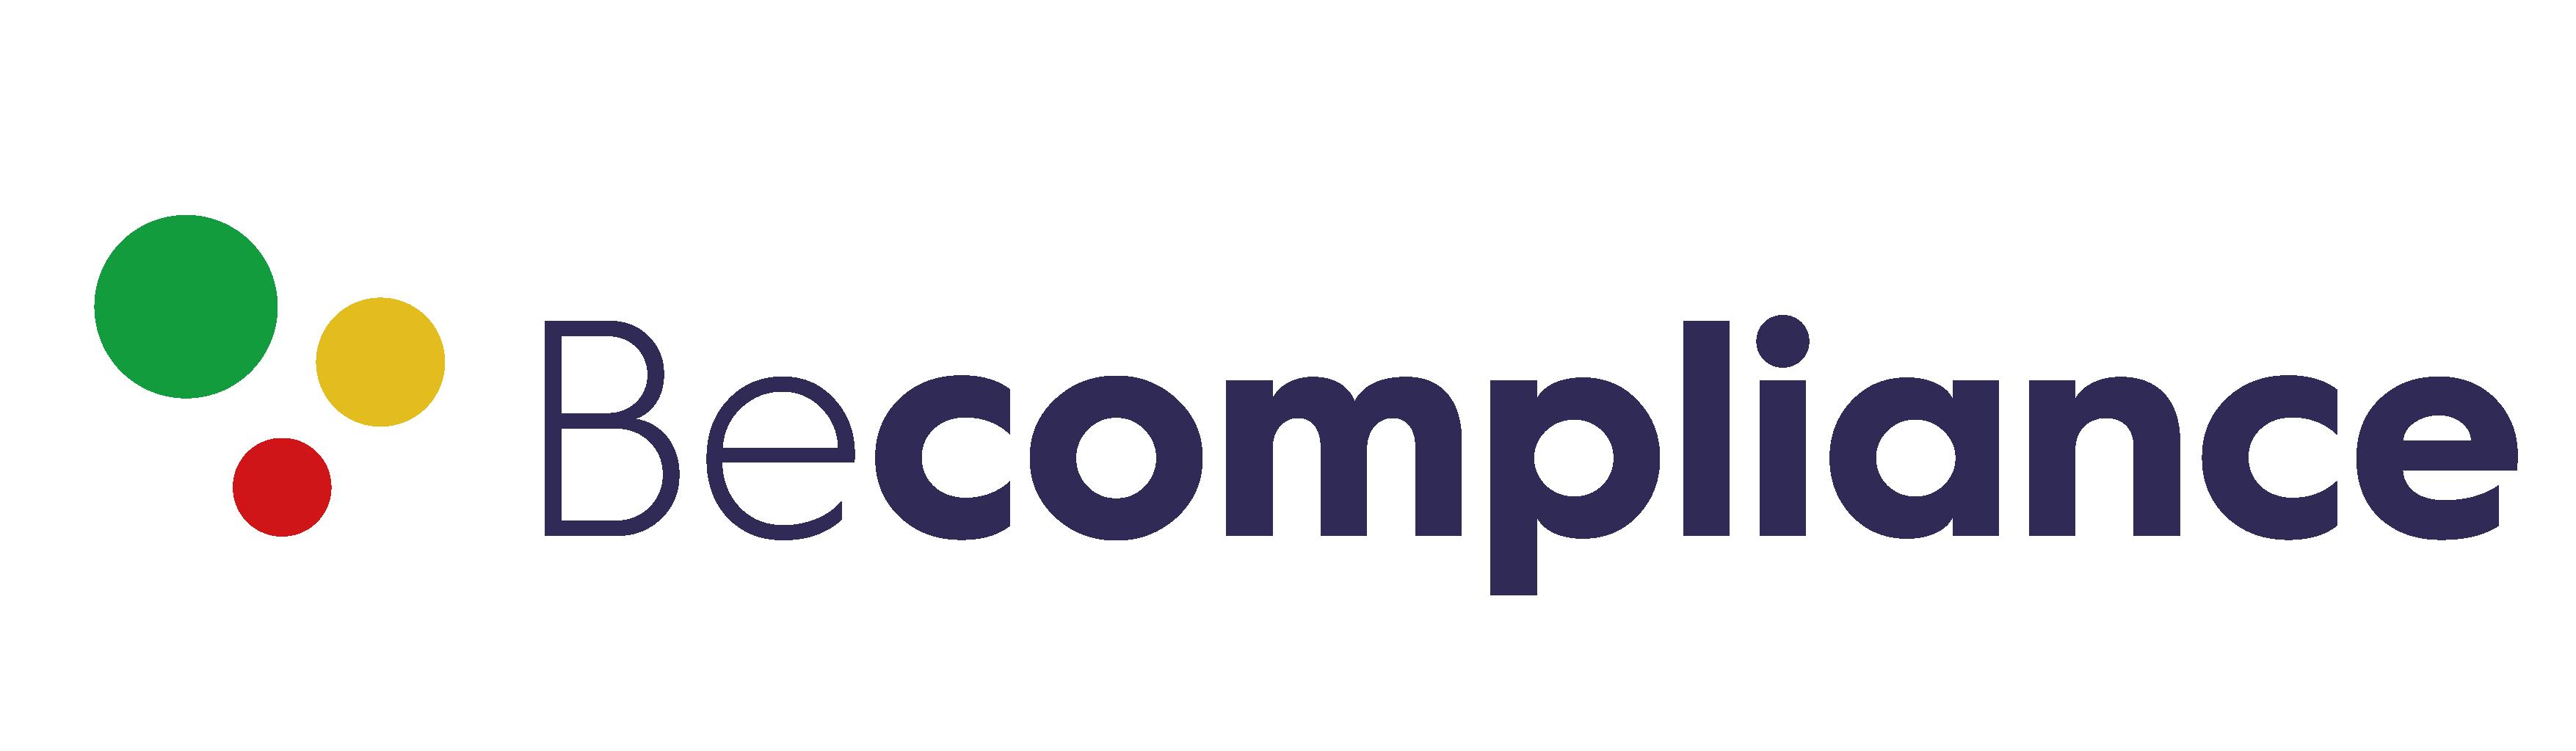 becompliance